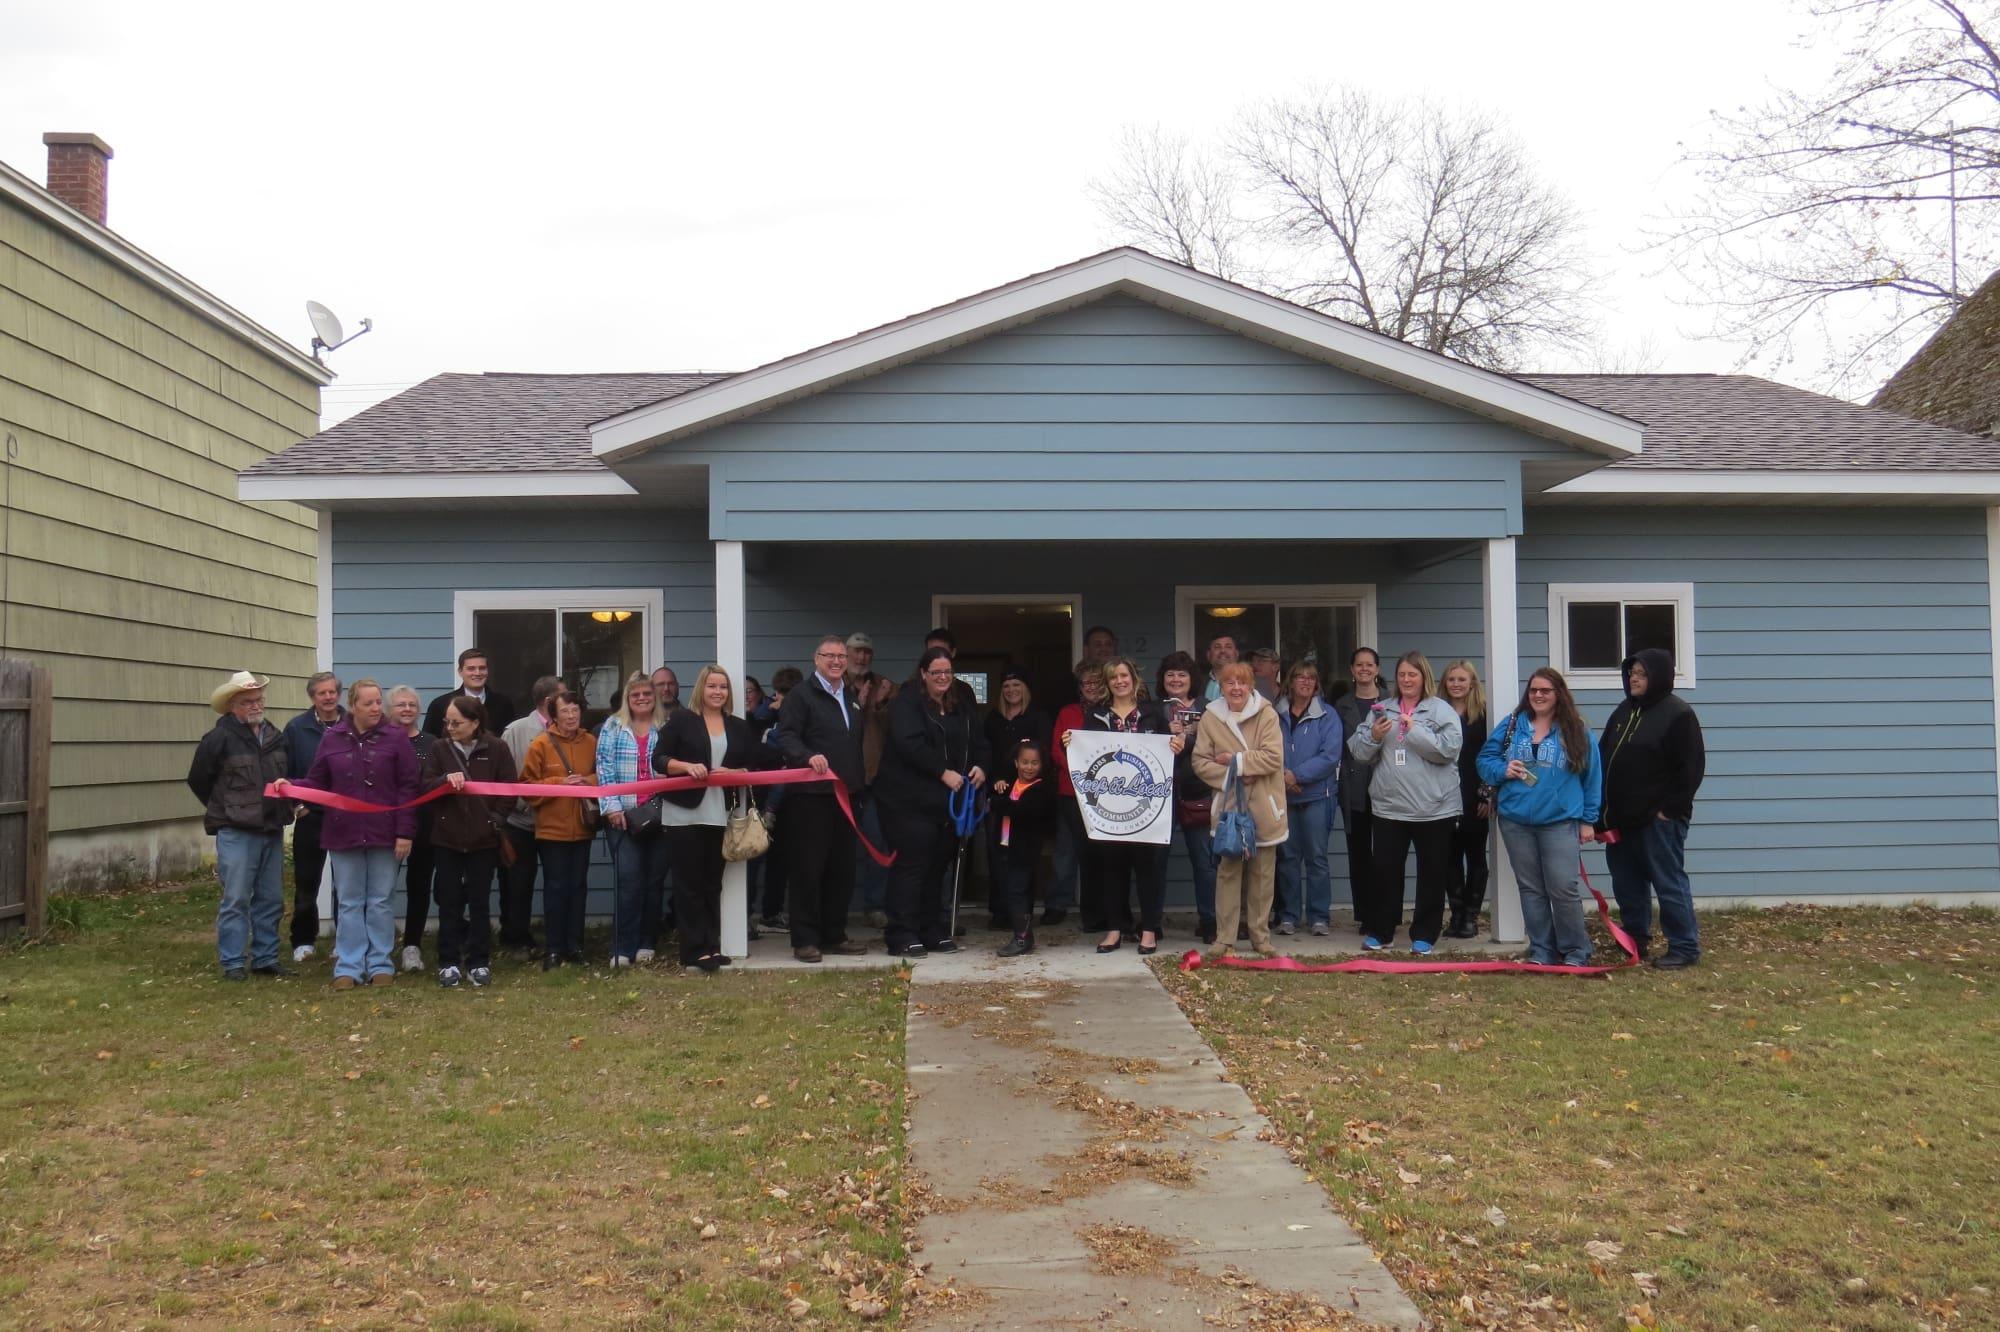 North St. Louis County Habitat for Humanity Home Dedication - Zozgornik Family